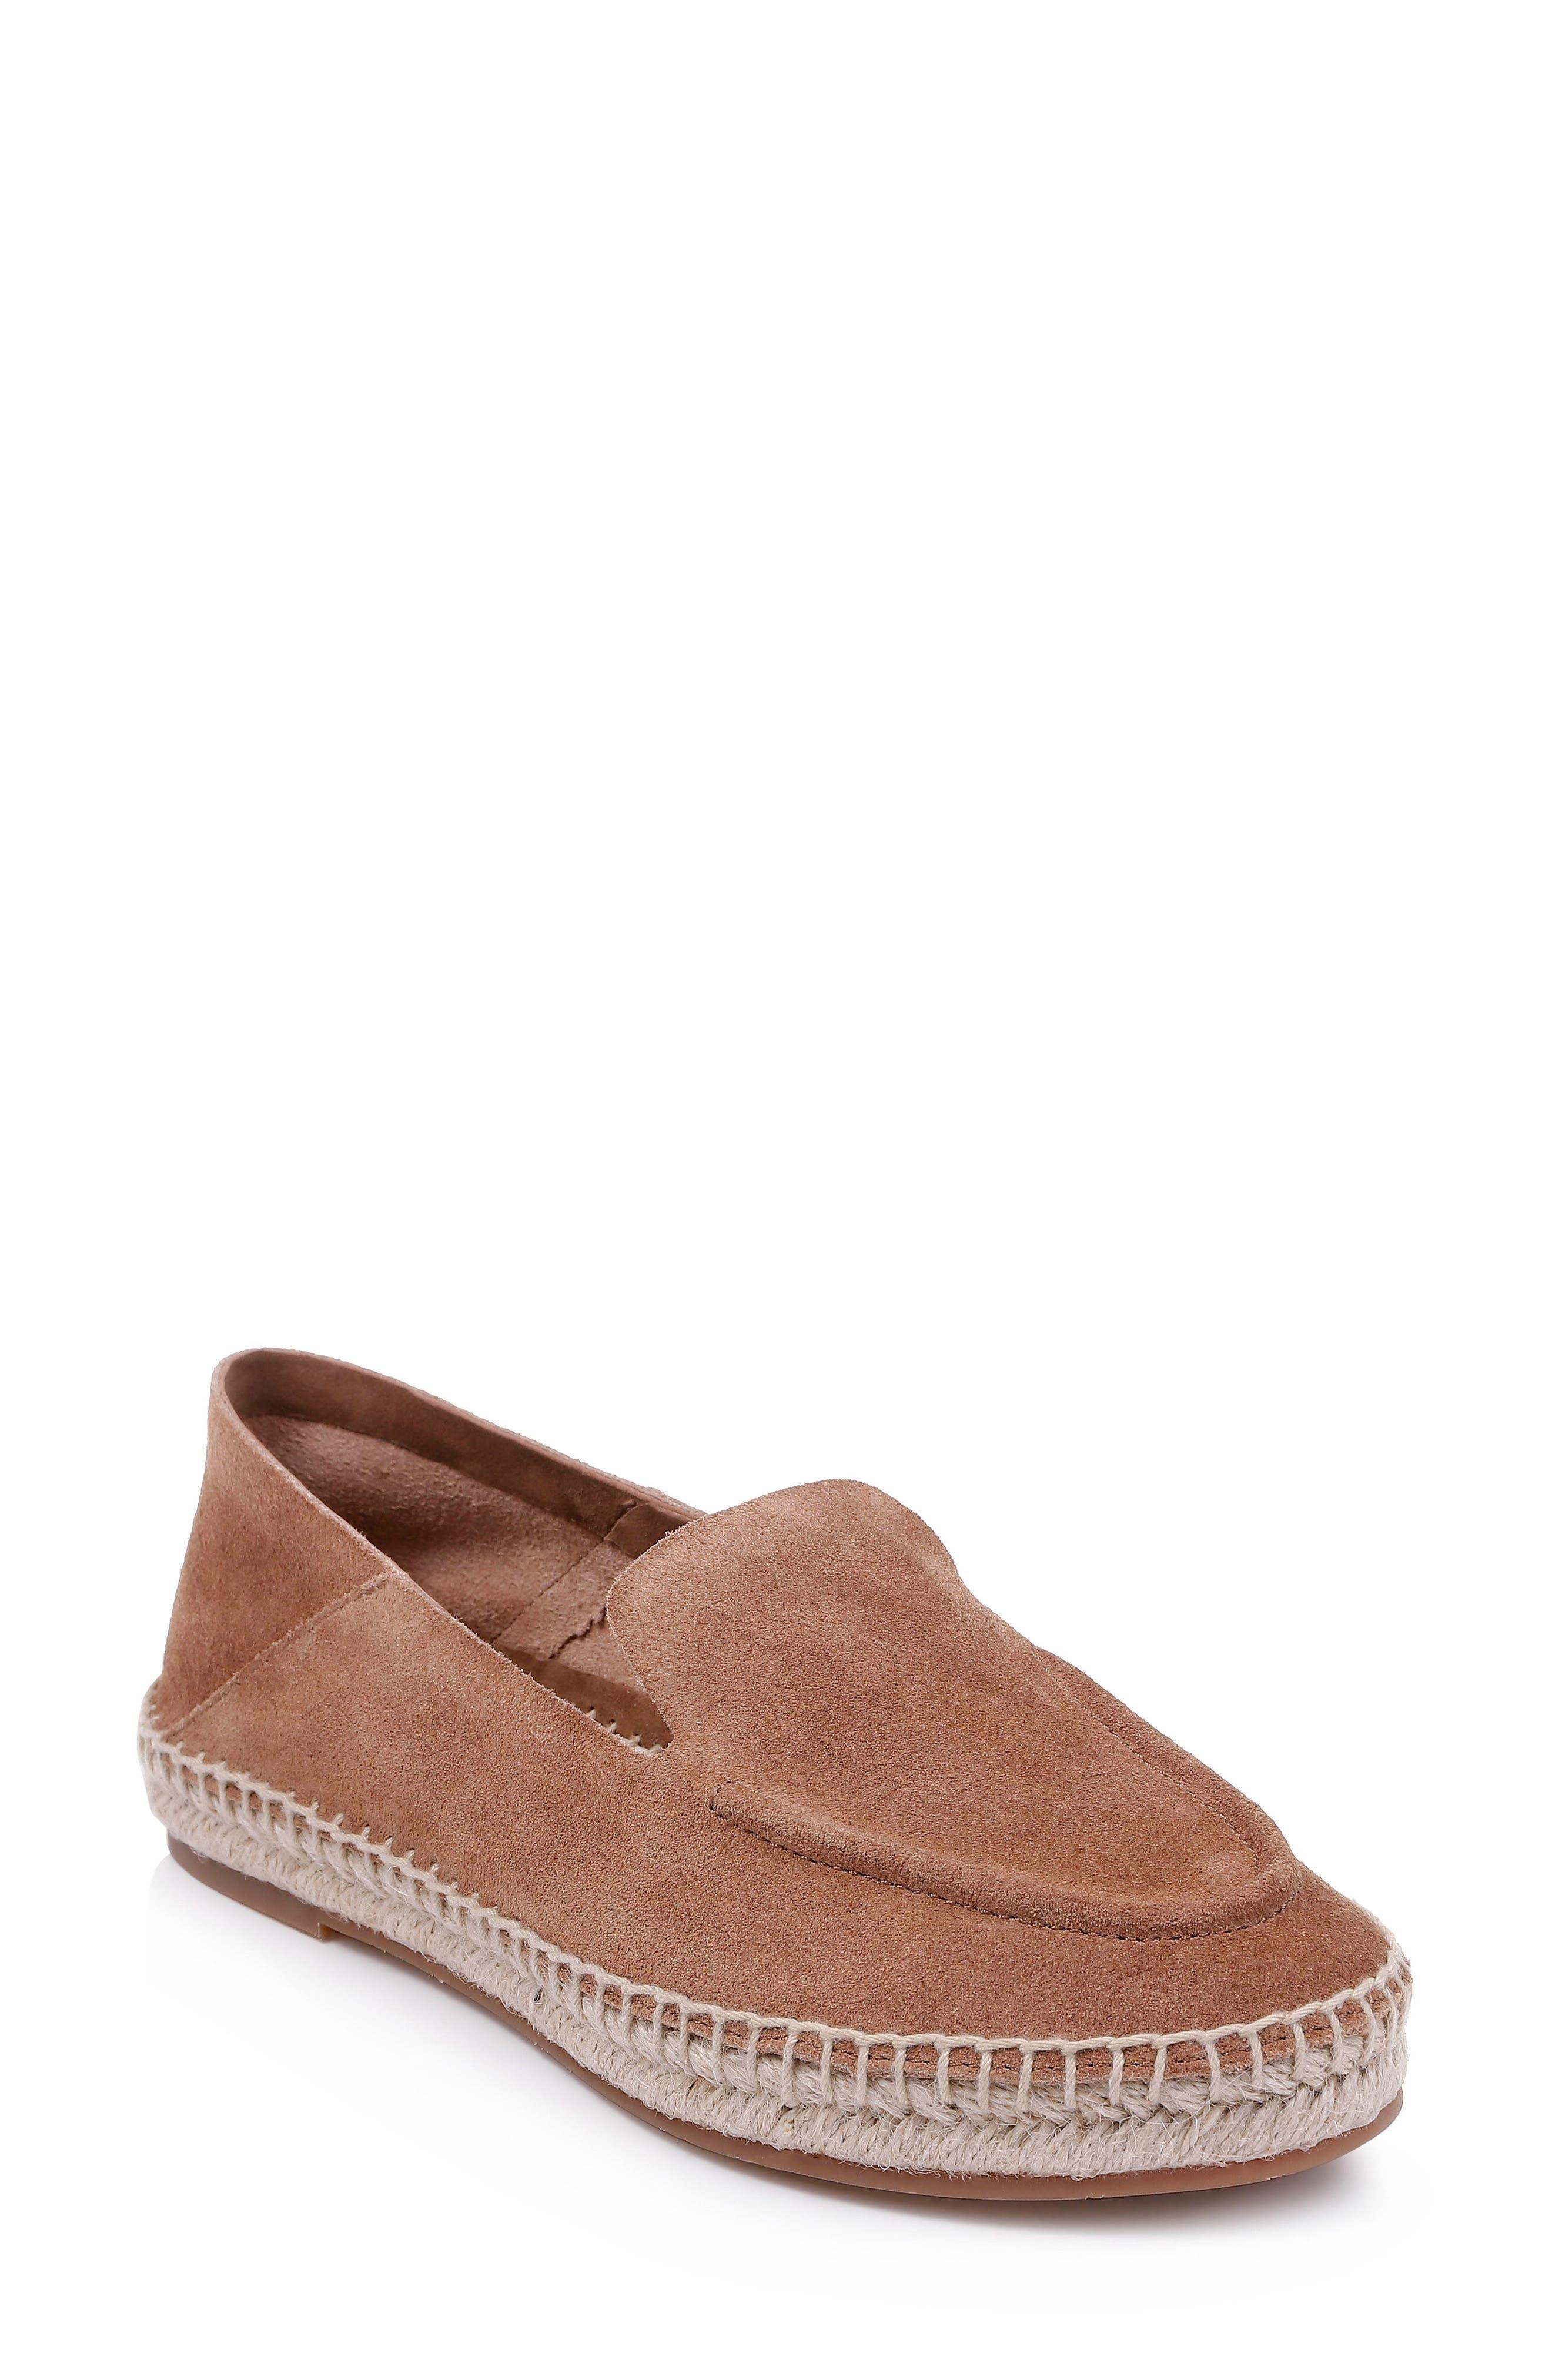 Simplicity Espadrille Loafer, Main, color, LATTE BROWN SUEDE